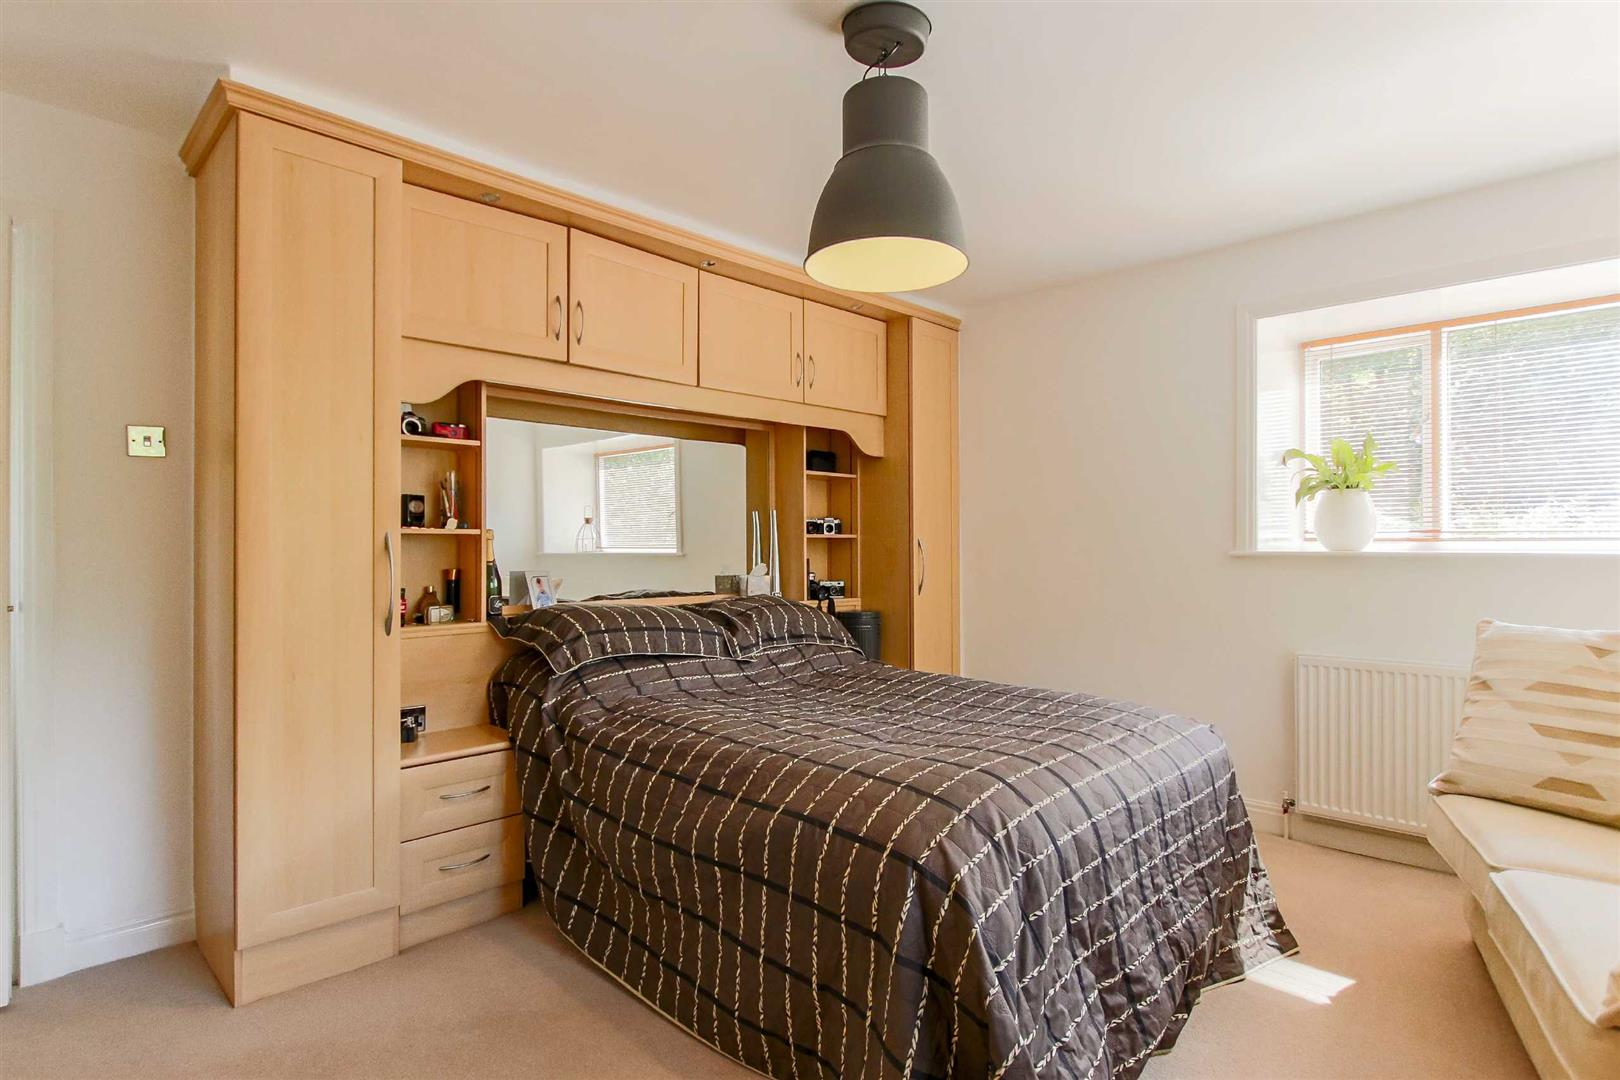 4 Bedroom Detached House For Sale - p006990_12.jpg